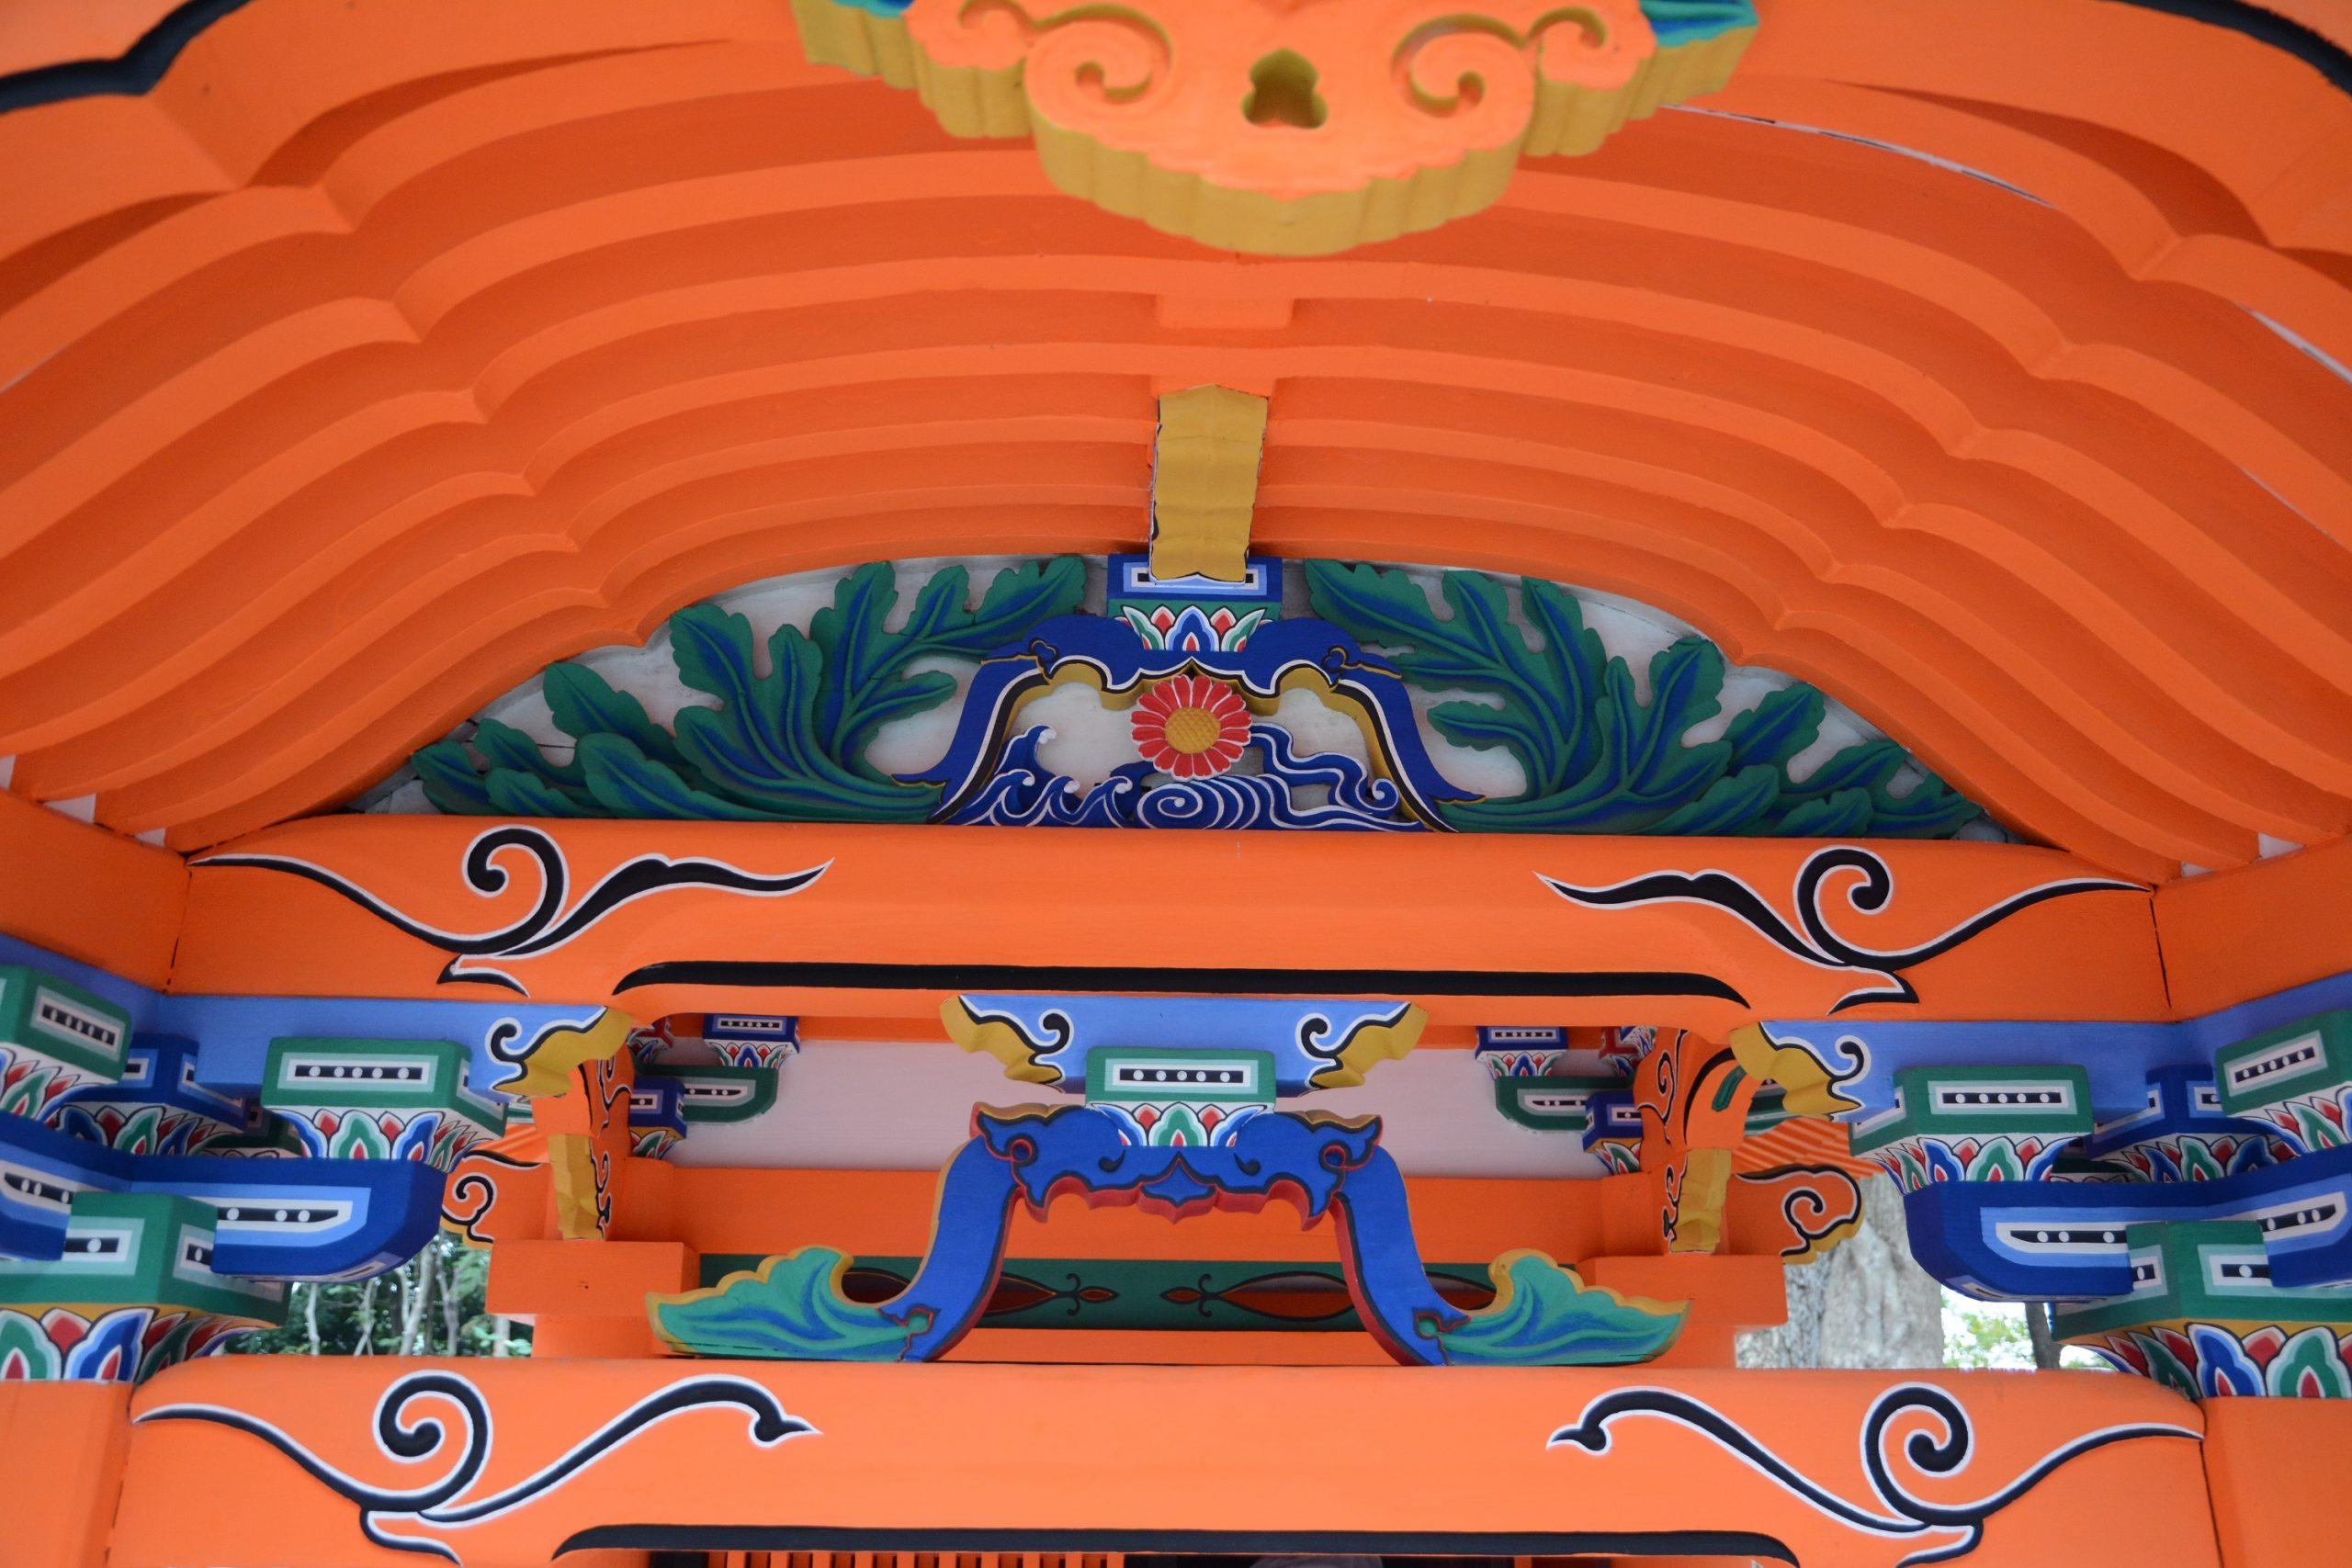 <p>向拝上部の詳細</p>向拝虹梁上の軒桁受の蟇股は、内部に菊水を飾り輪郭の足元は、長大な若葉(菊の葉)に発達している。